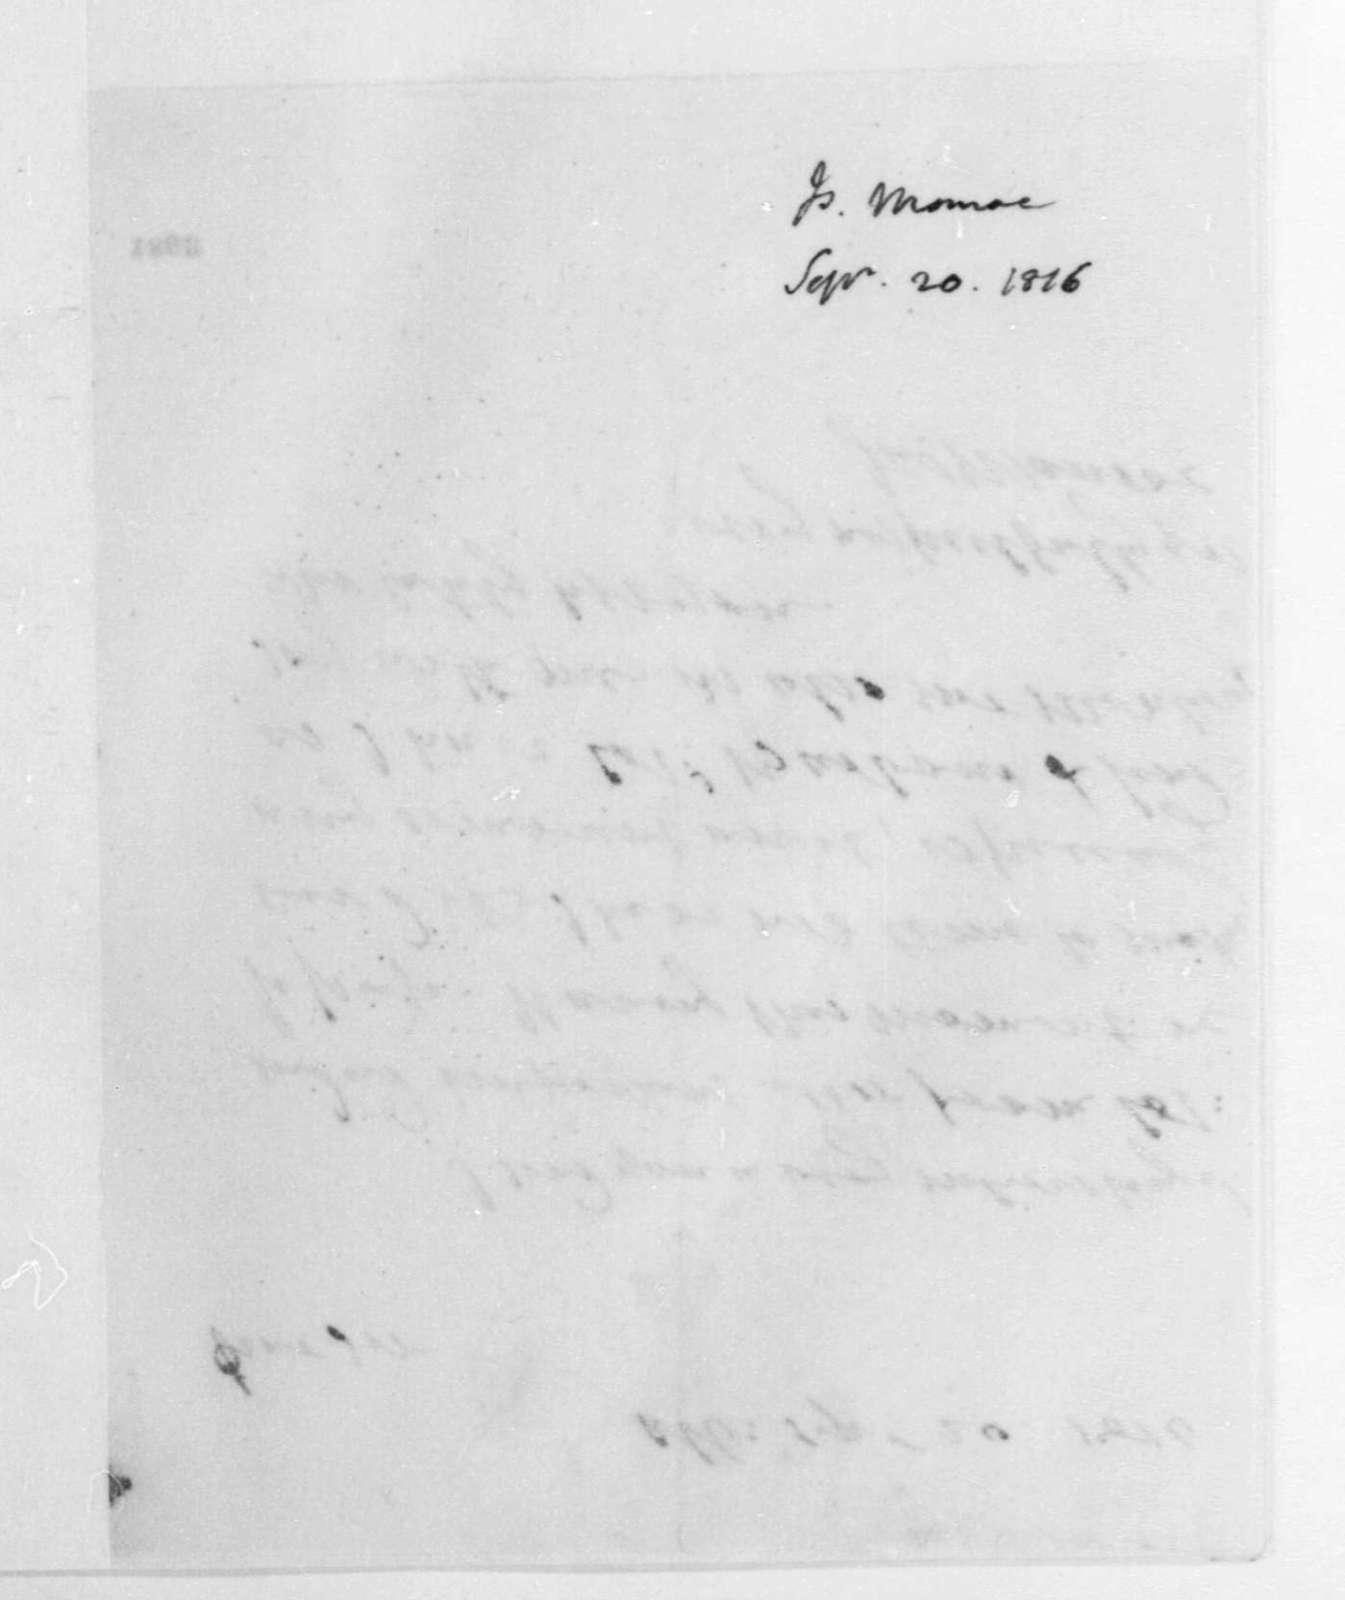 James Monroe to James Madison, September 20, 1816.